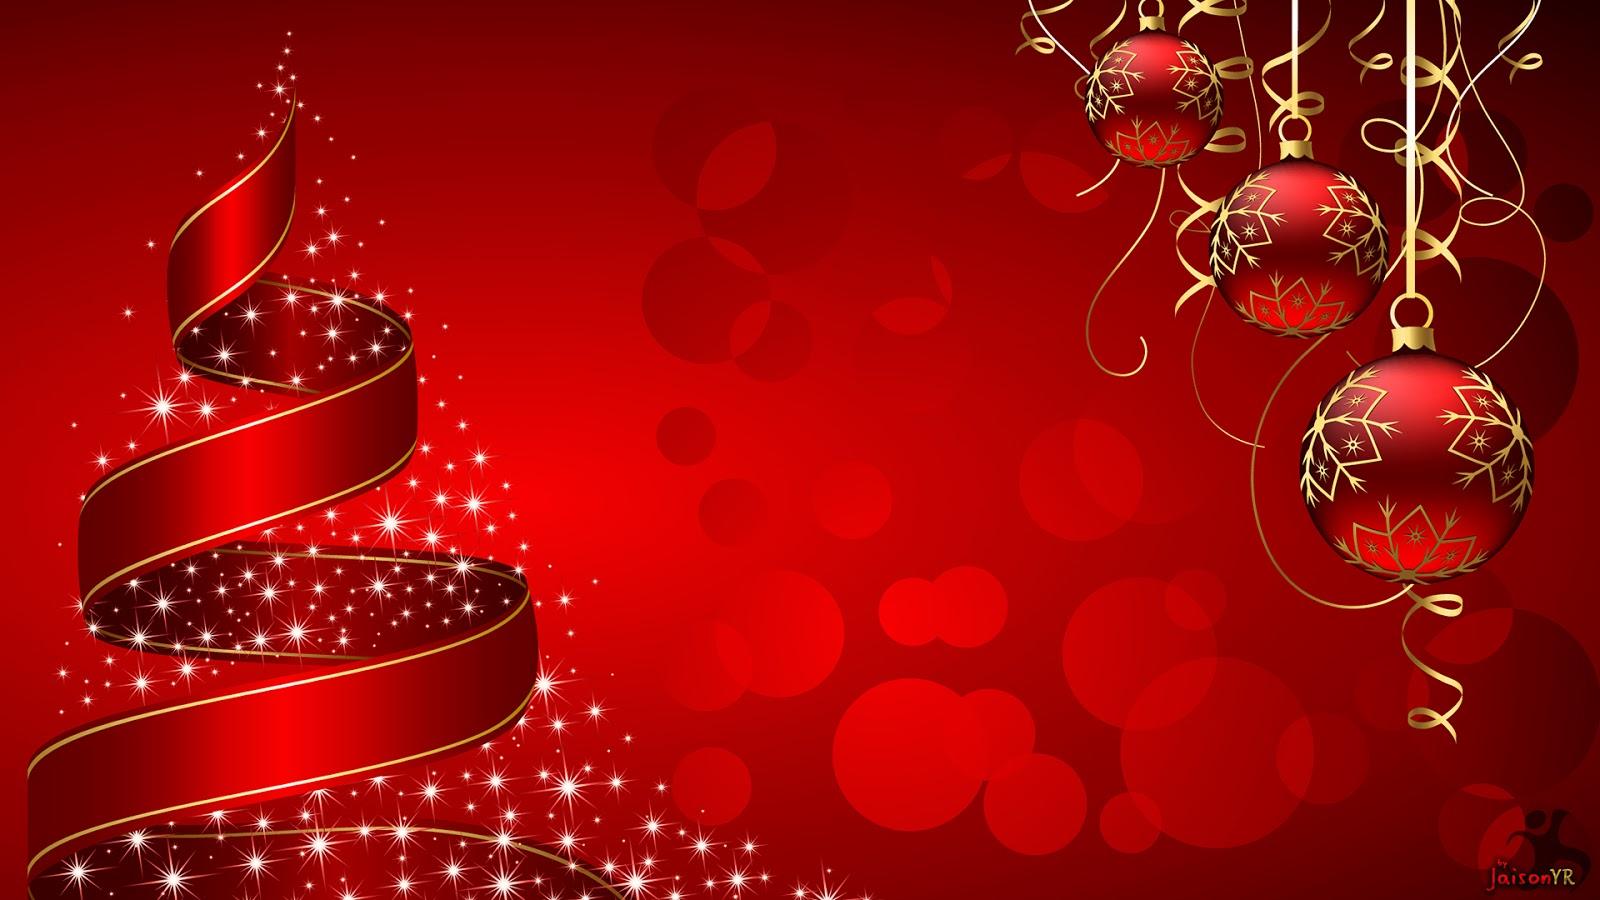 Frases De Boas Festas Para Clientes: Danahfjare: Boas Festas Para Facebook